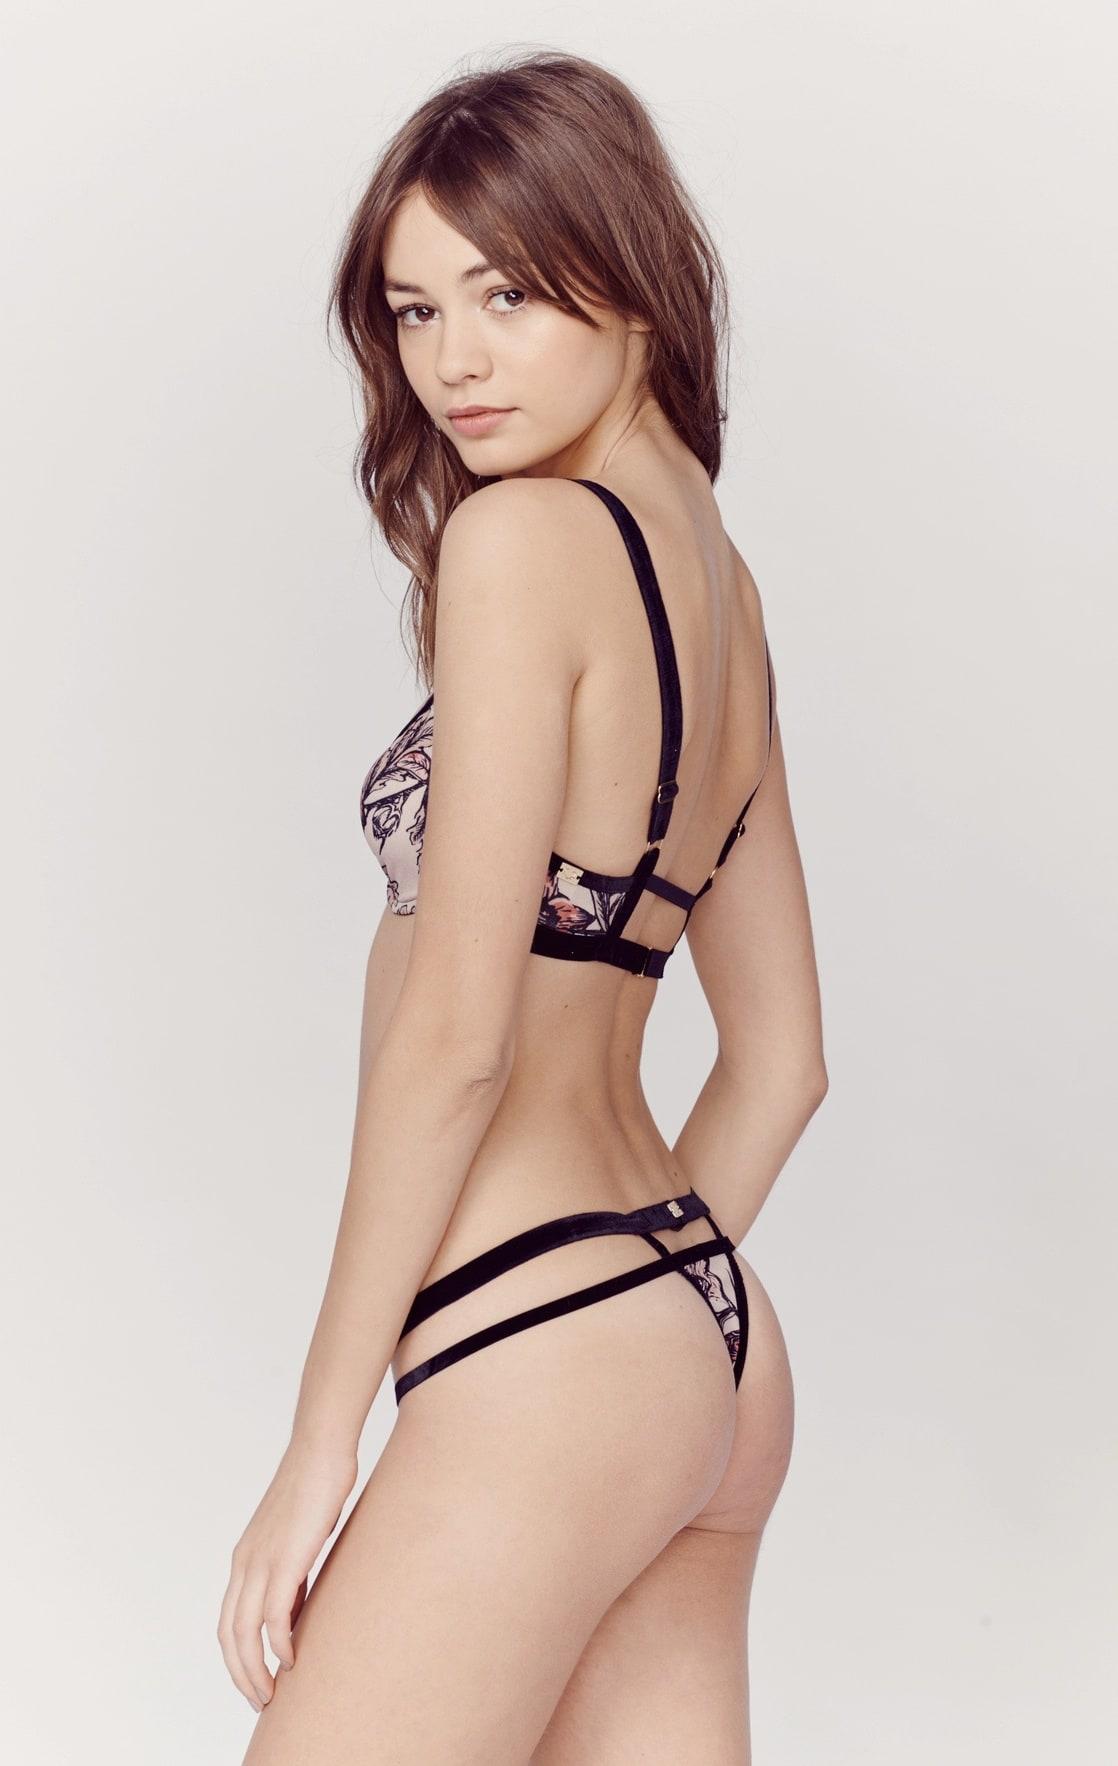 ICloud Beate Muska nude (74 photo), Is a cute